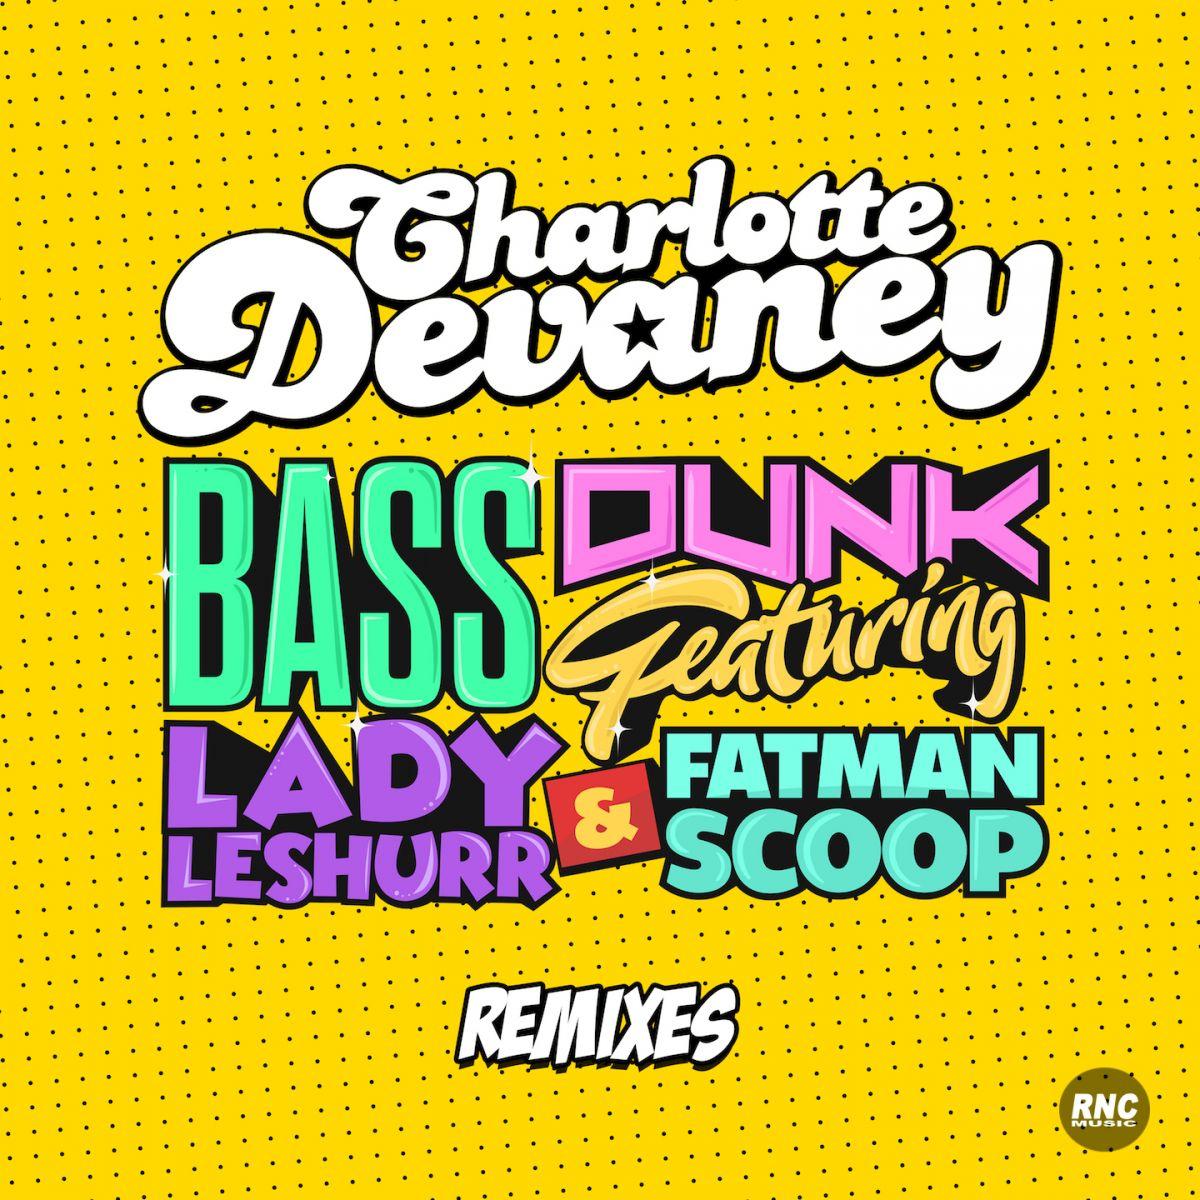 Charlotte Devaney ft  Fatman Scoop & Lady Leshurr - Bass